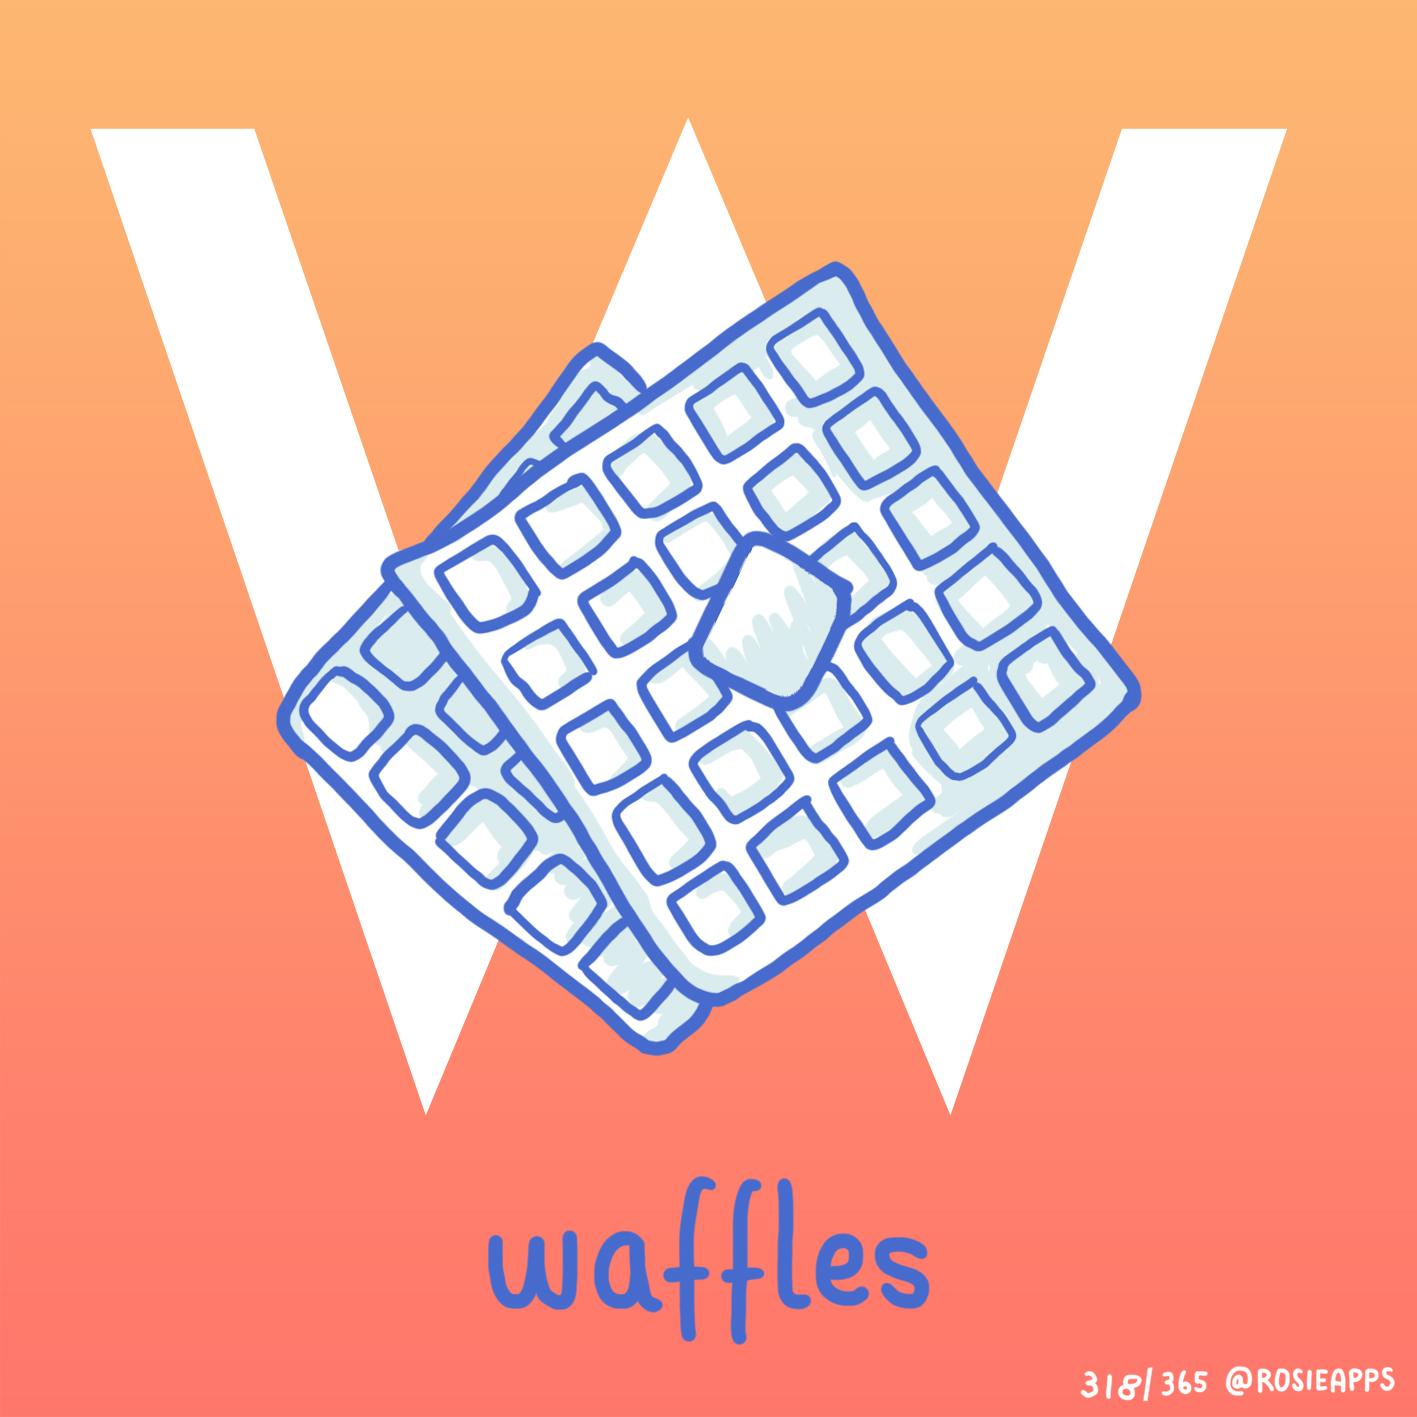 November-318-365 Waffles.jpg